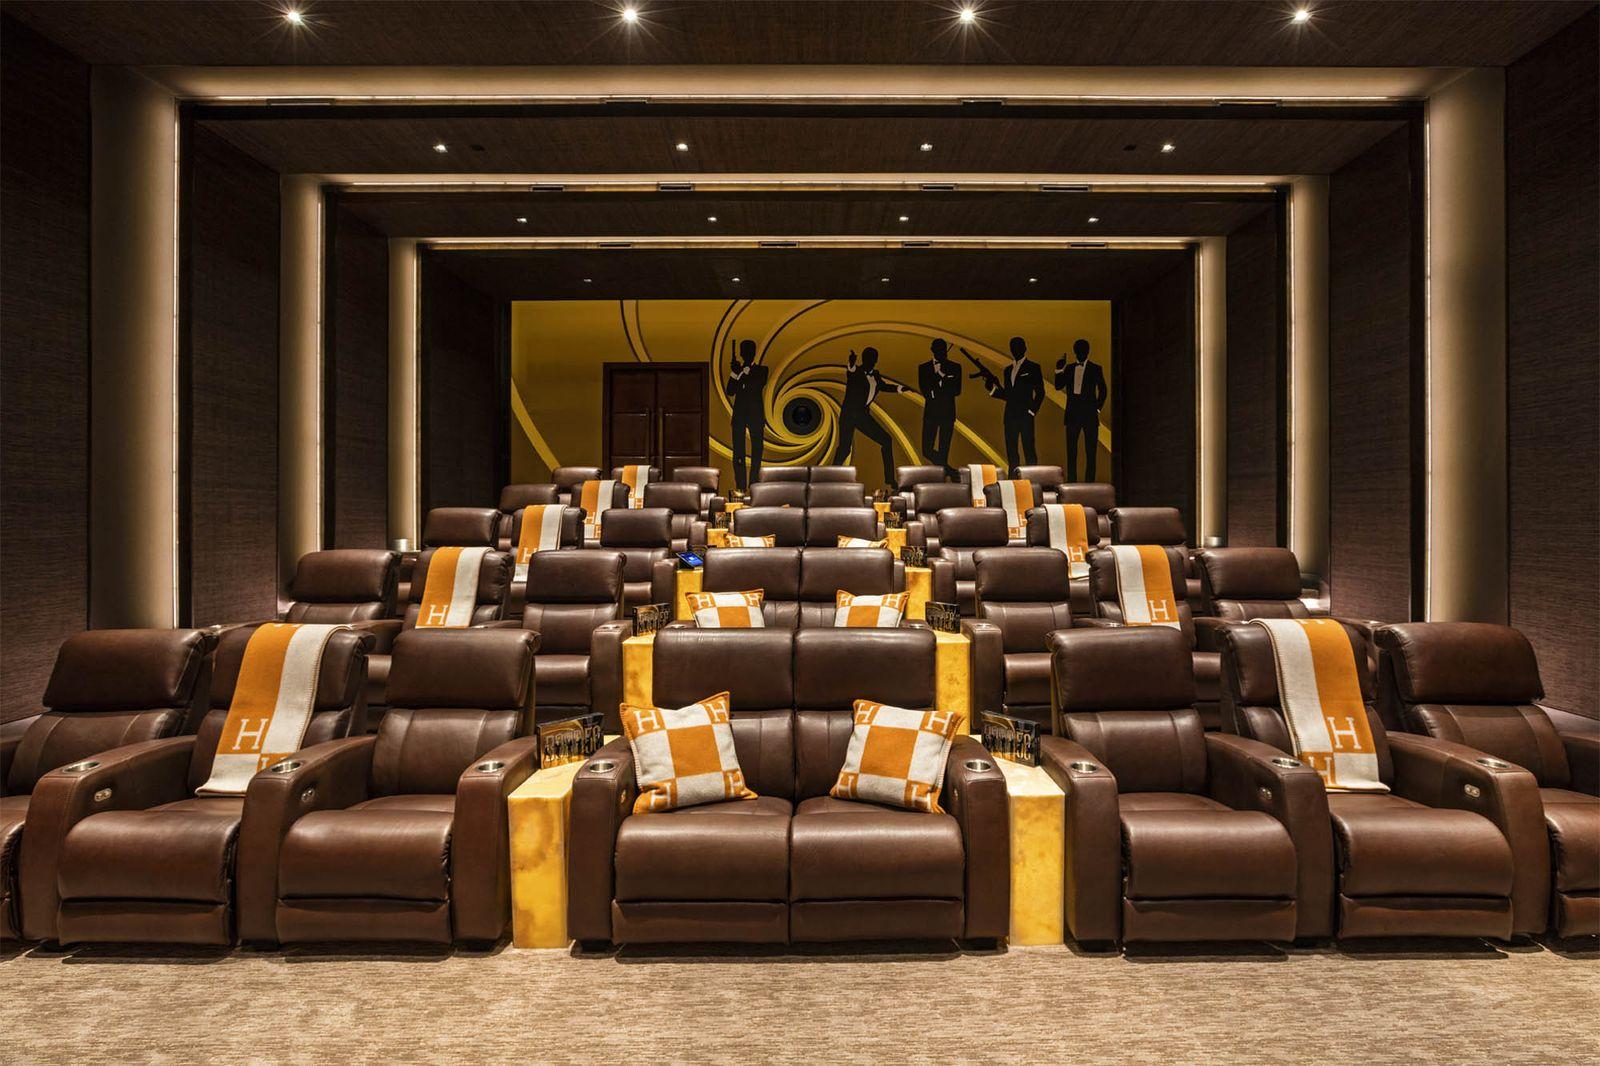 Bruce Makowsky's Cinema Room